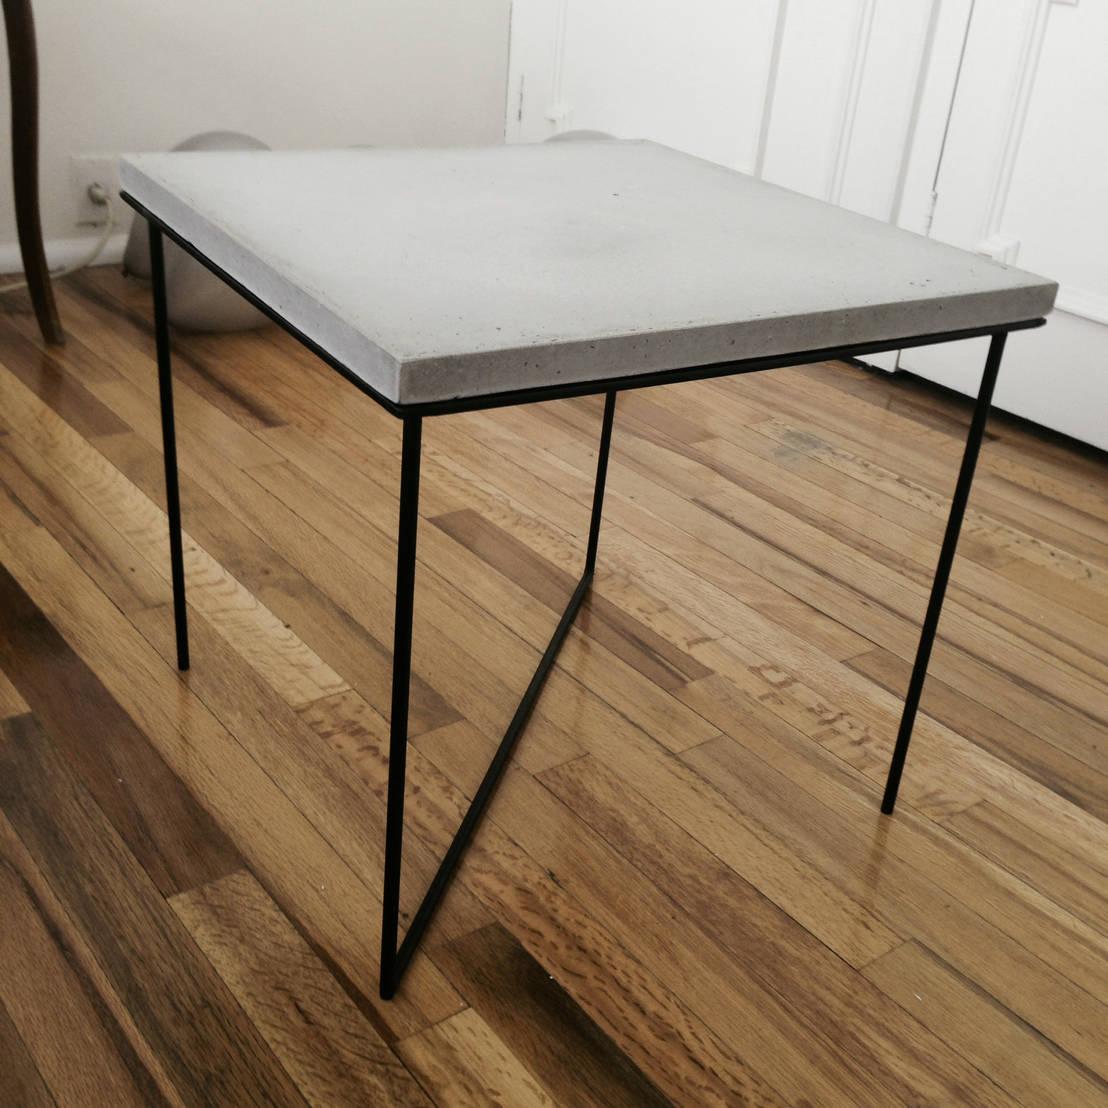 Mesa carlota de mdc muebles de concreto homify - Muebles serafin la carlota ...